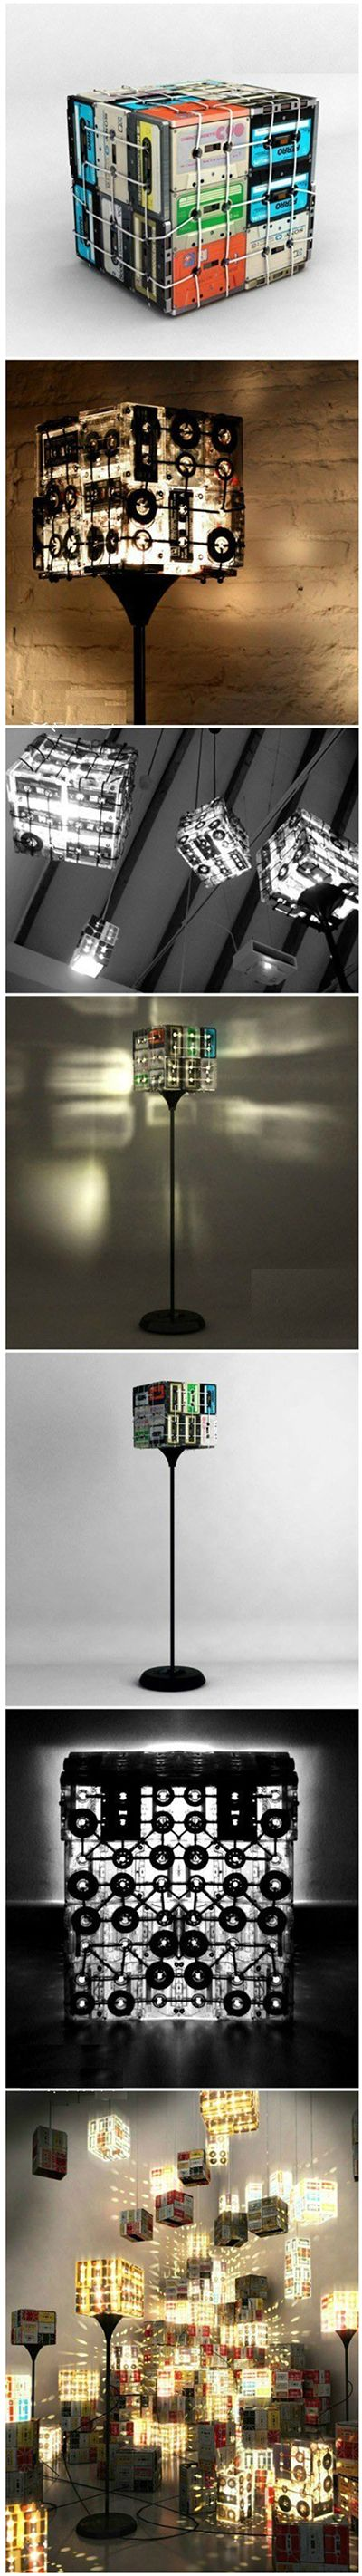 recyclage de cassettes audios une id e lumineuse la retaperie. Black Bedroom Furniture Sets. Home Design Ideas